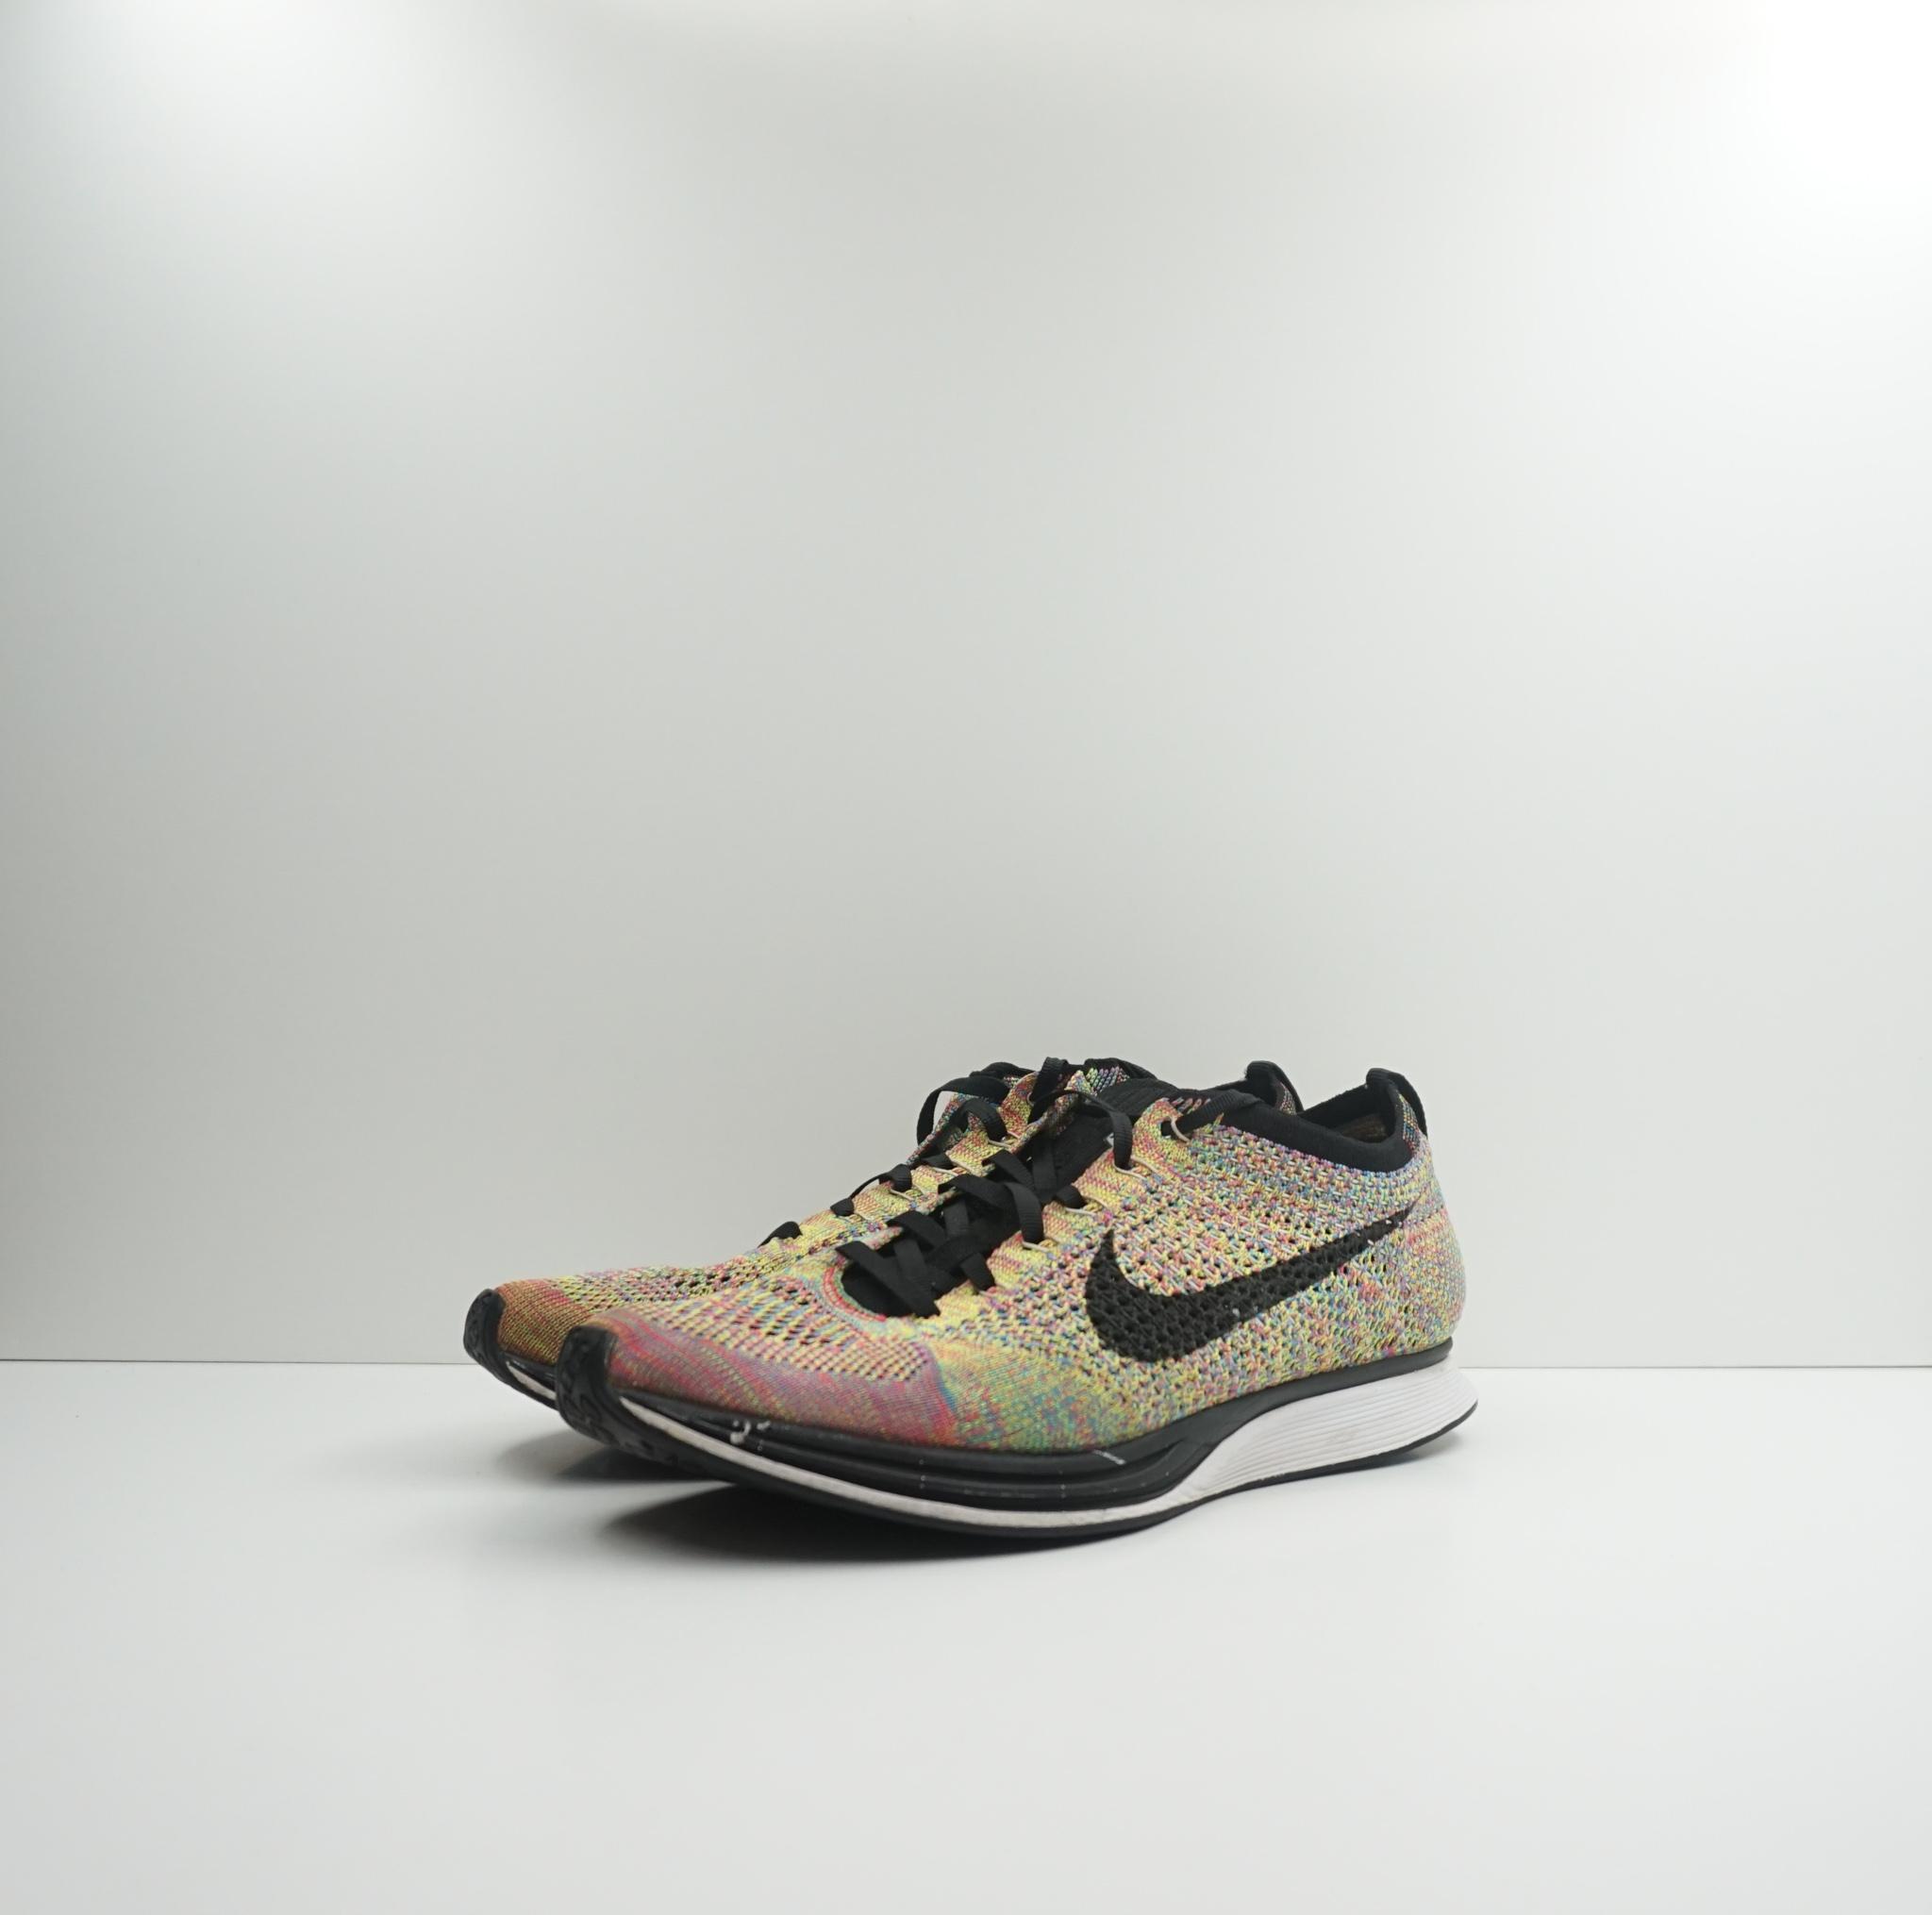 Nike Flyknit Racer Multi-Color